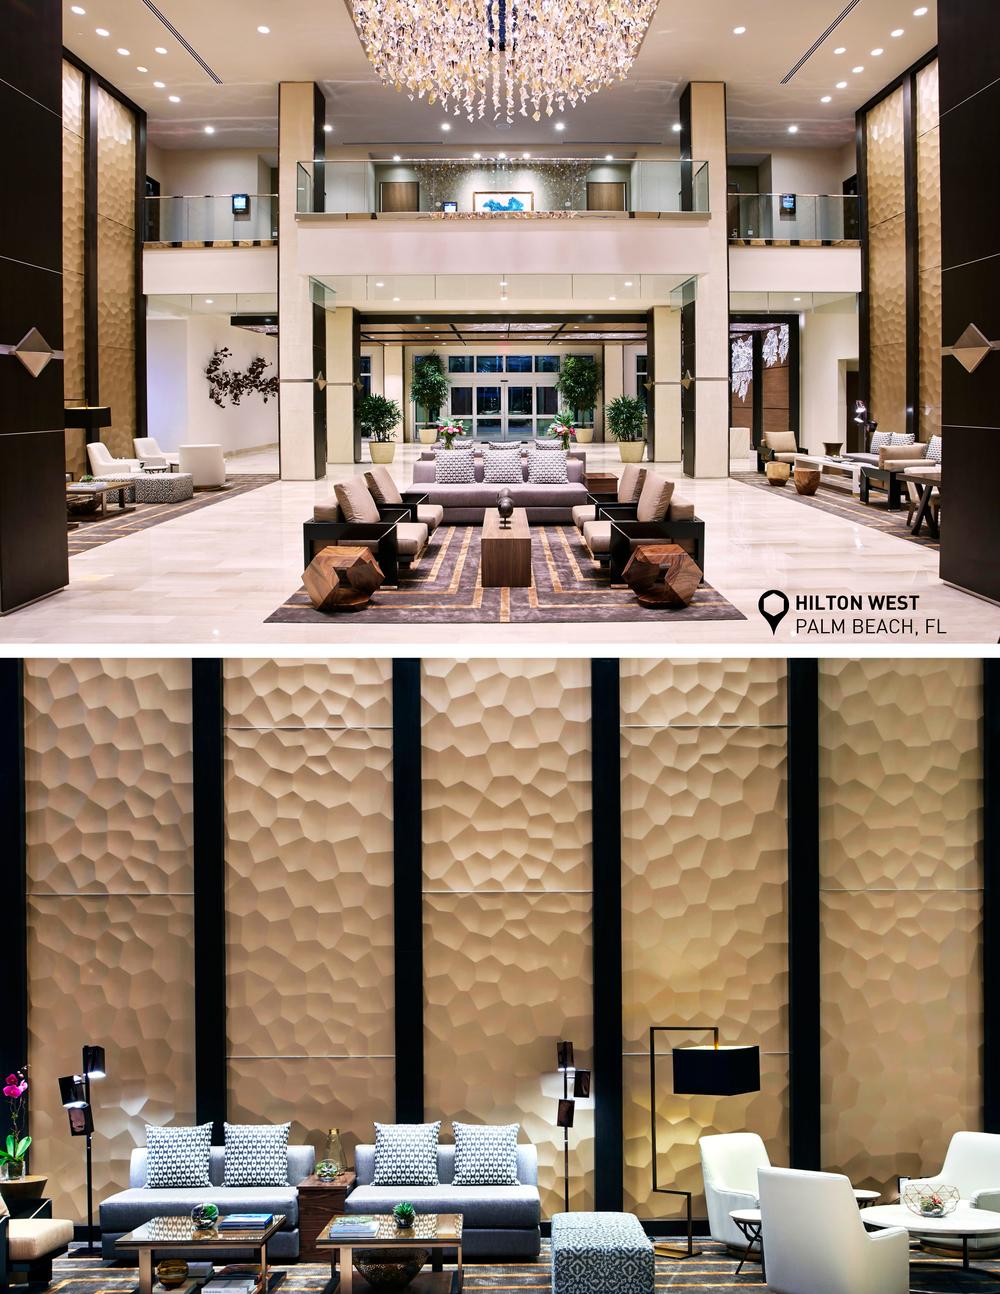 HiltonWestPalmBeach_CarvedWall2.jpg